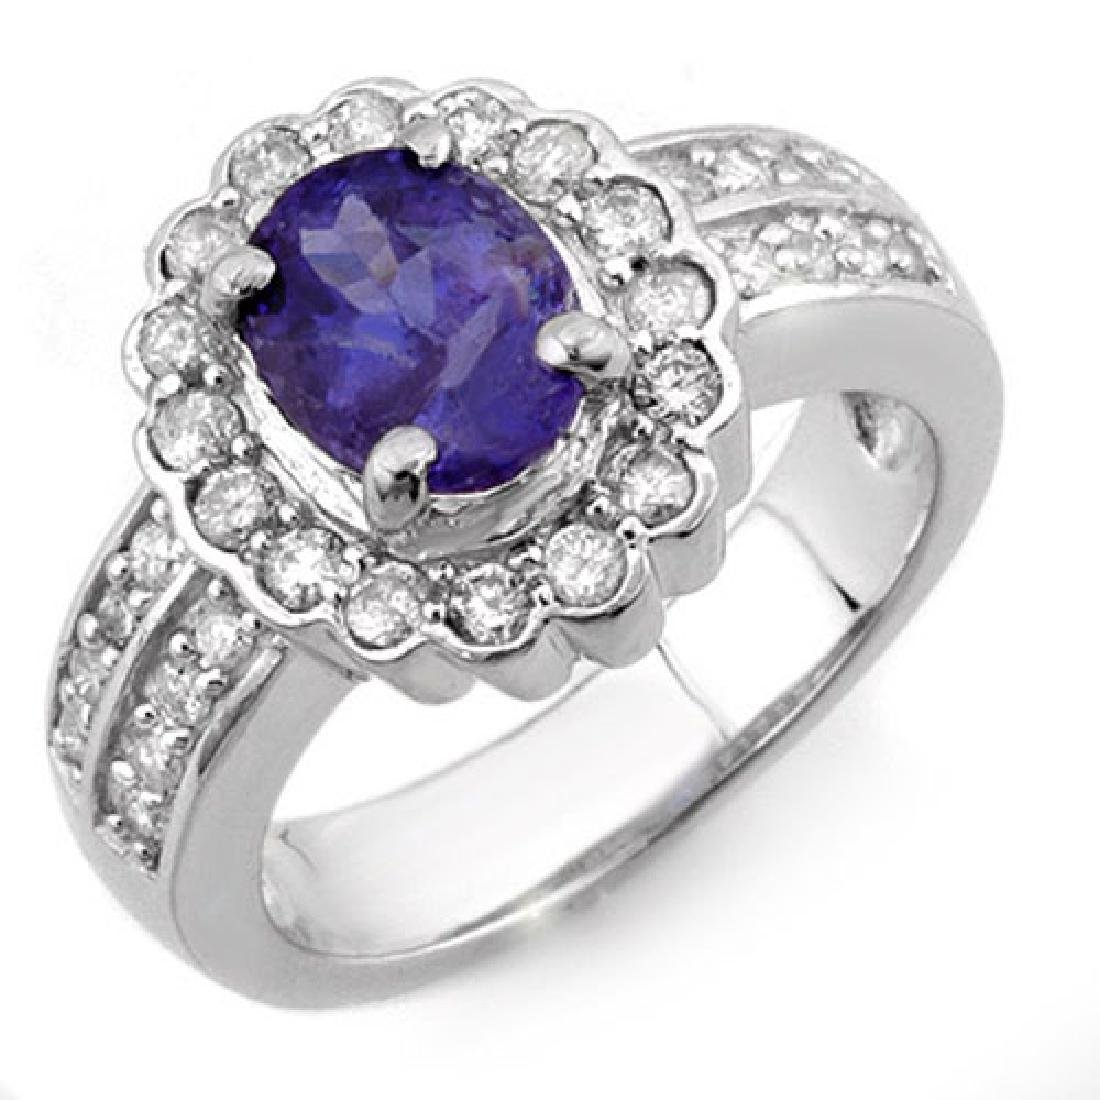 2.60 CTW Tanzanite & Diamond Ring 14K White Gold